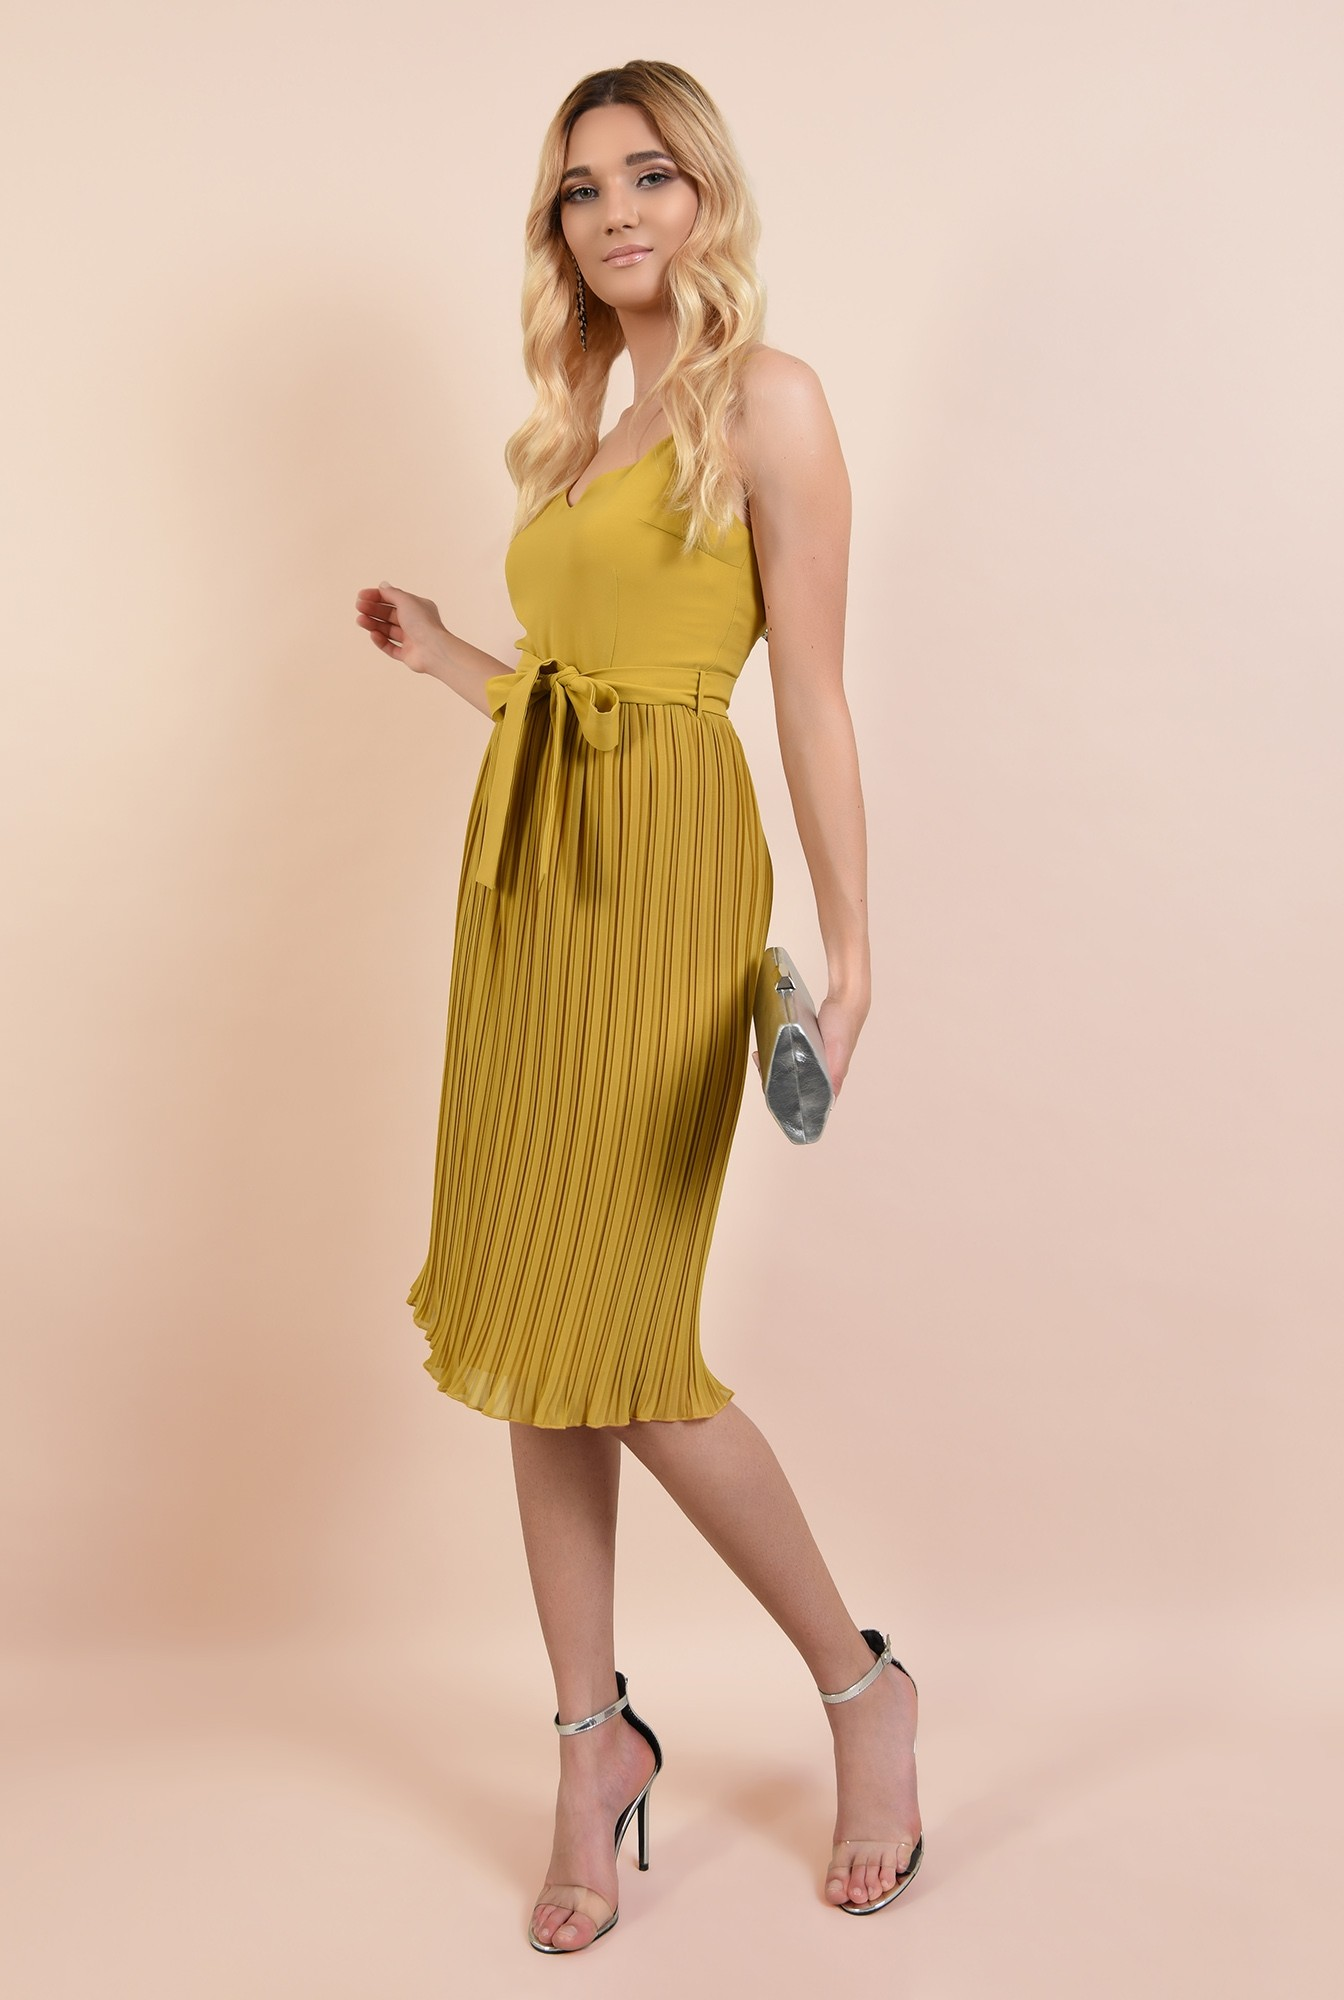 3 - 360 - rochie eleganta, mustar, cu bretele spaghetti, cordon in talie, fusta plisata